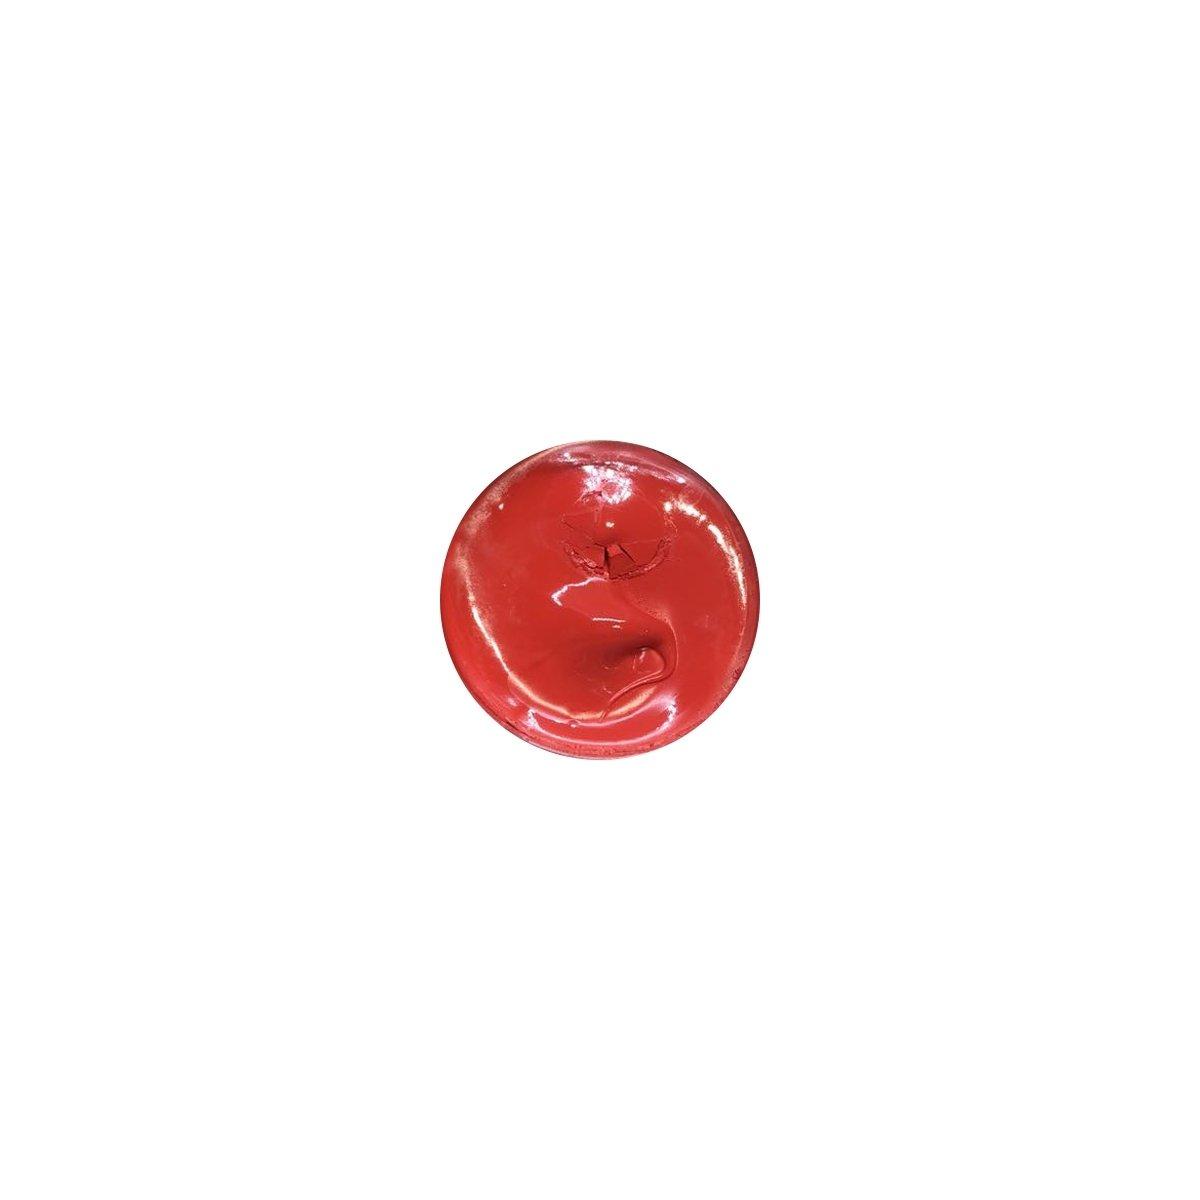 Tinta Genesis Pyrrole Red 04 - 4 gramas ou 8 gramas